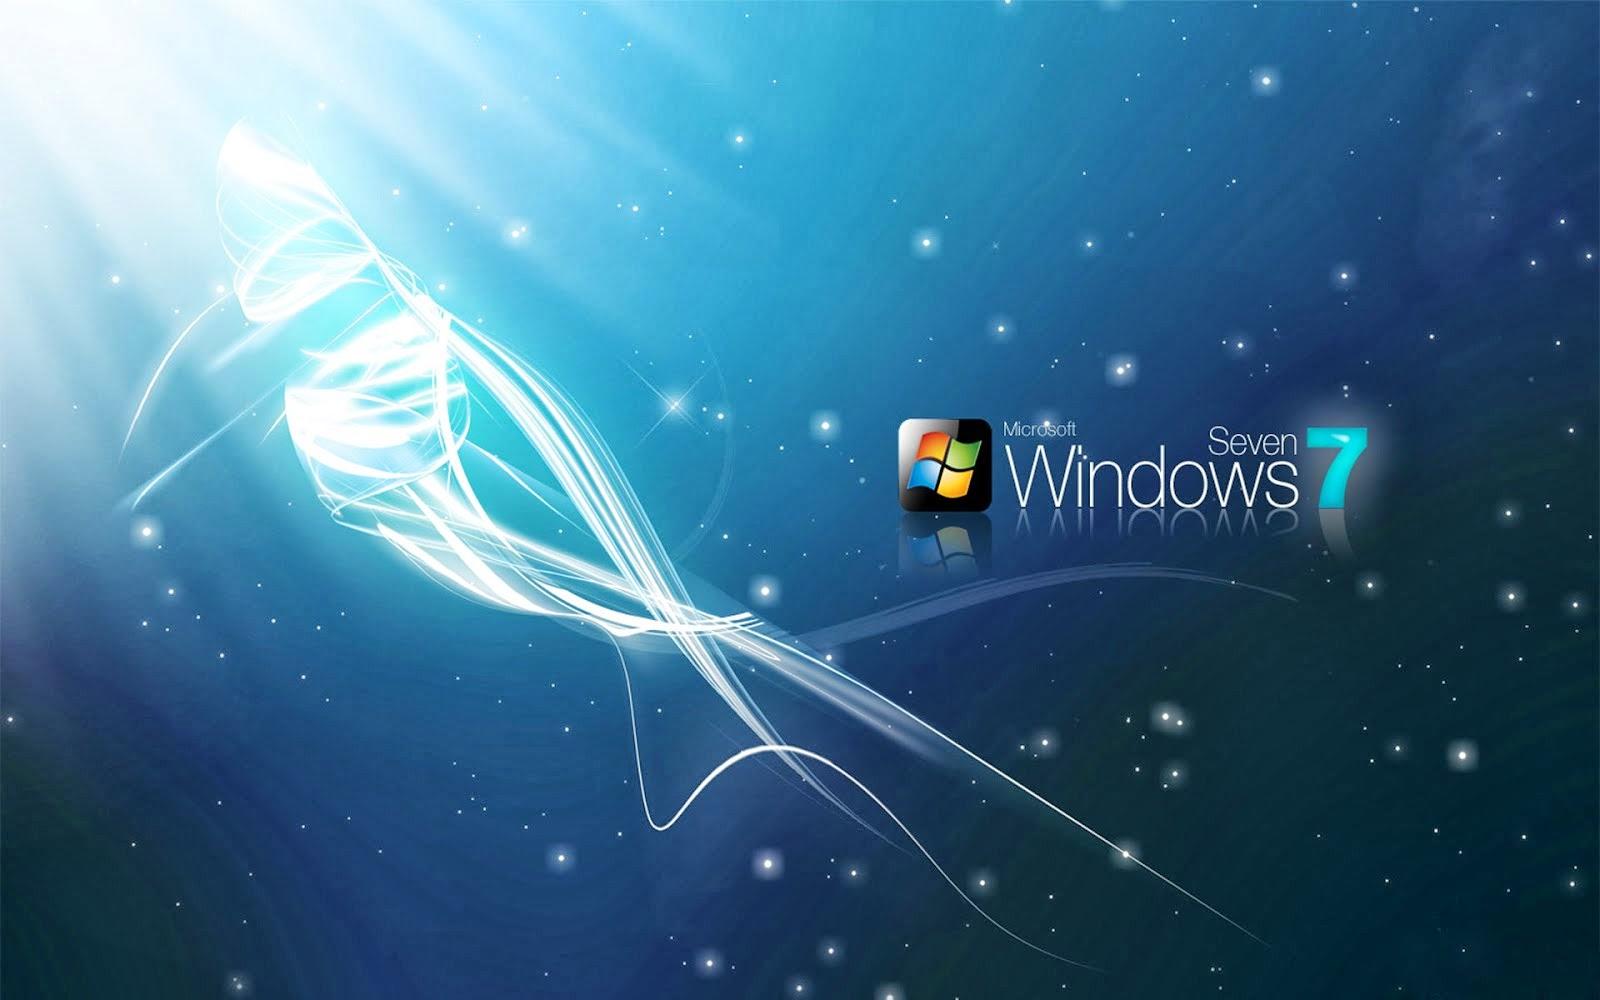 Animated matrix wallpaper windows 10 wallpapersafari - Anime screensaver windows 10 ...